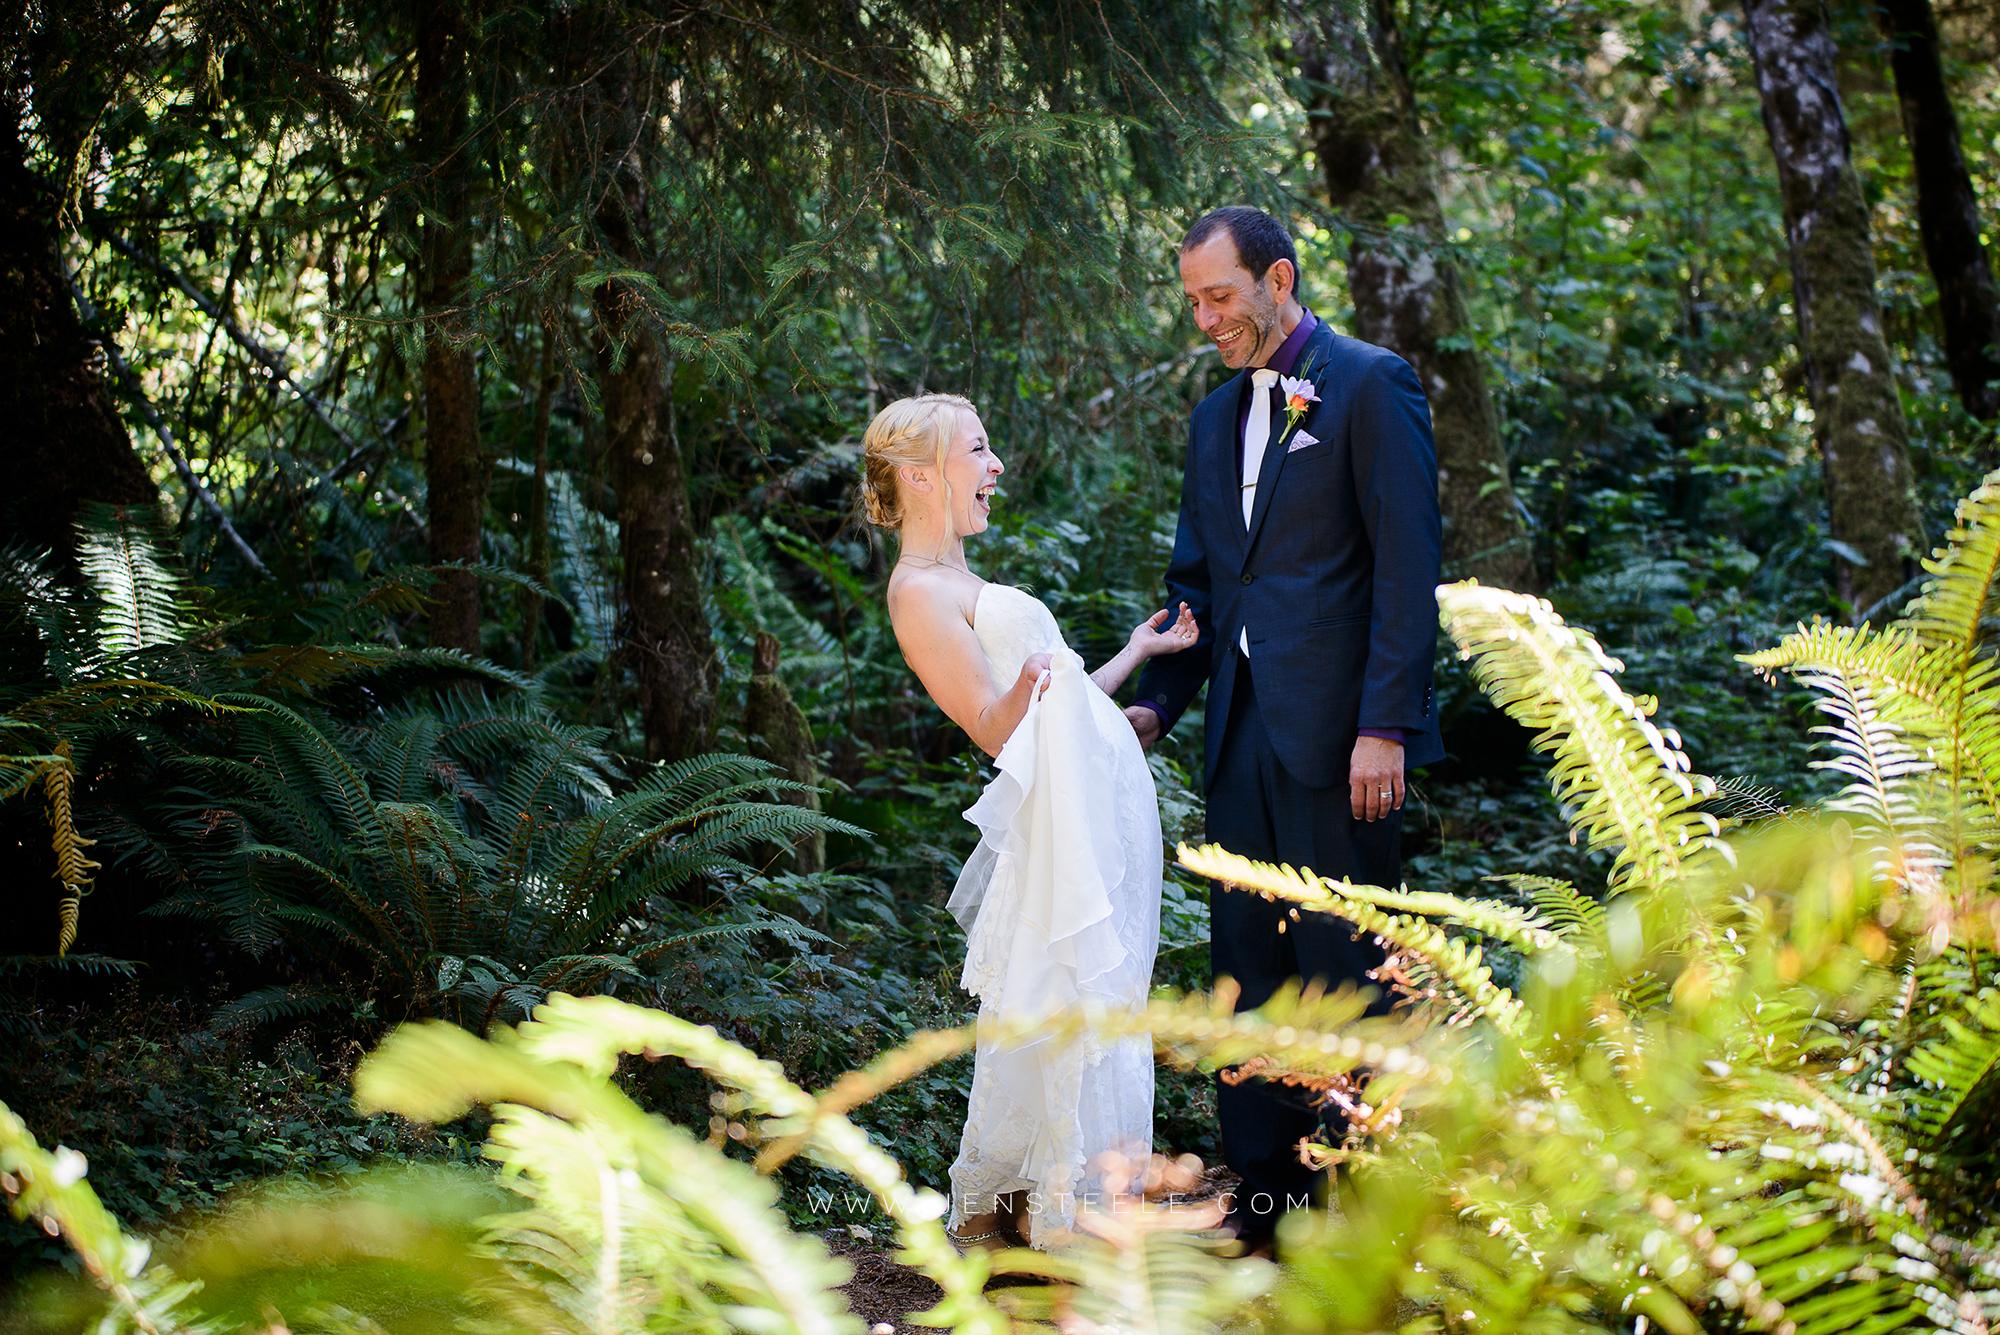 FRENCH-BEACH-WESTCOAST-WEDDINGS-JEN-STEELE-PHOTOGRAPHY